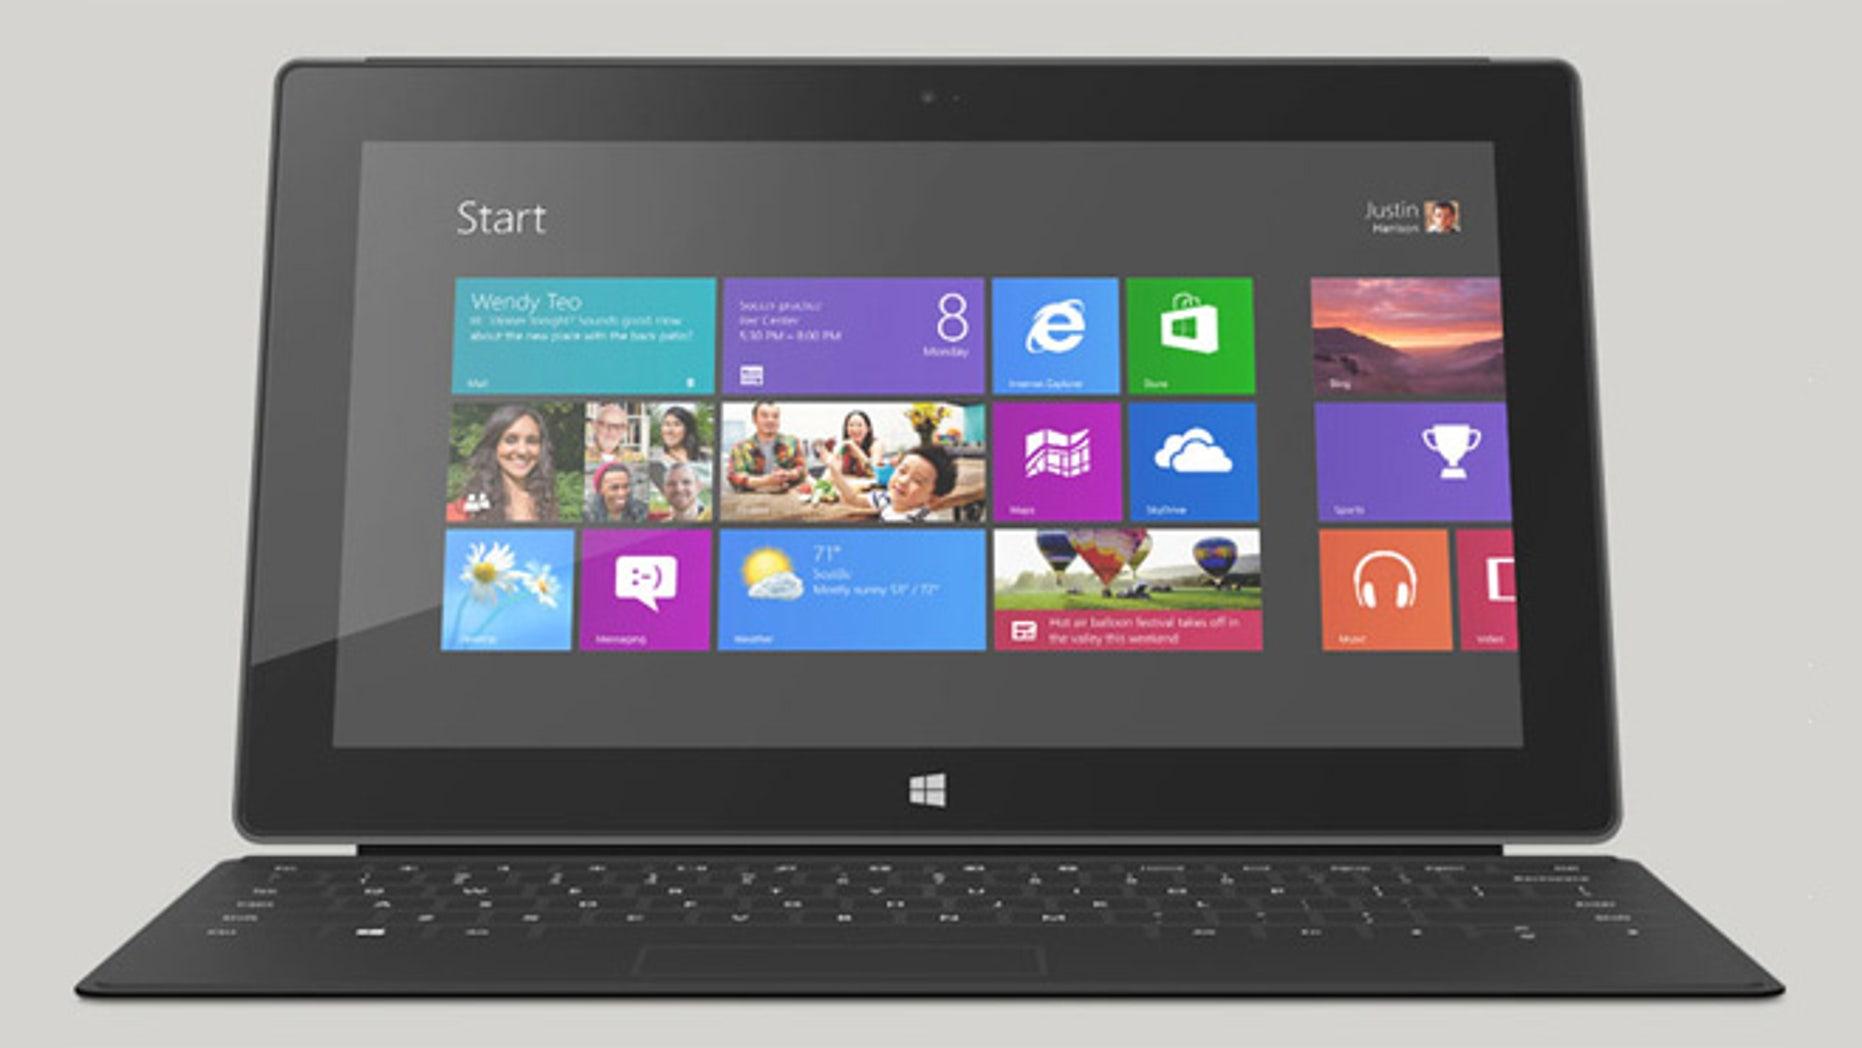 Microsoft's Surface Windows 8 Pro starts at $899.